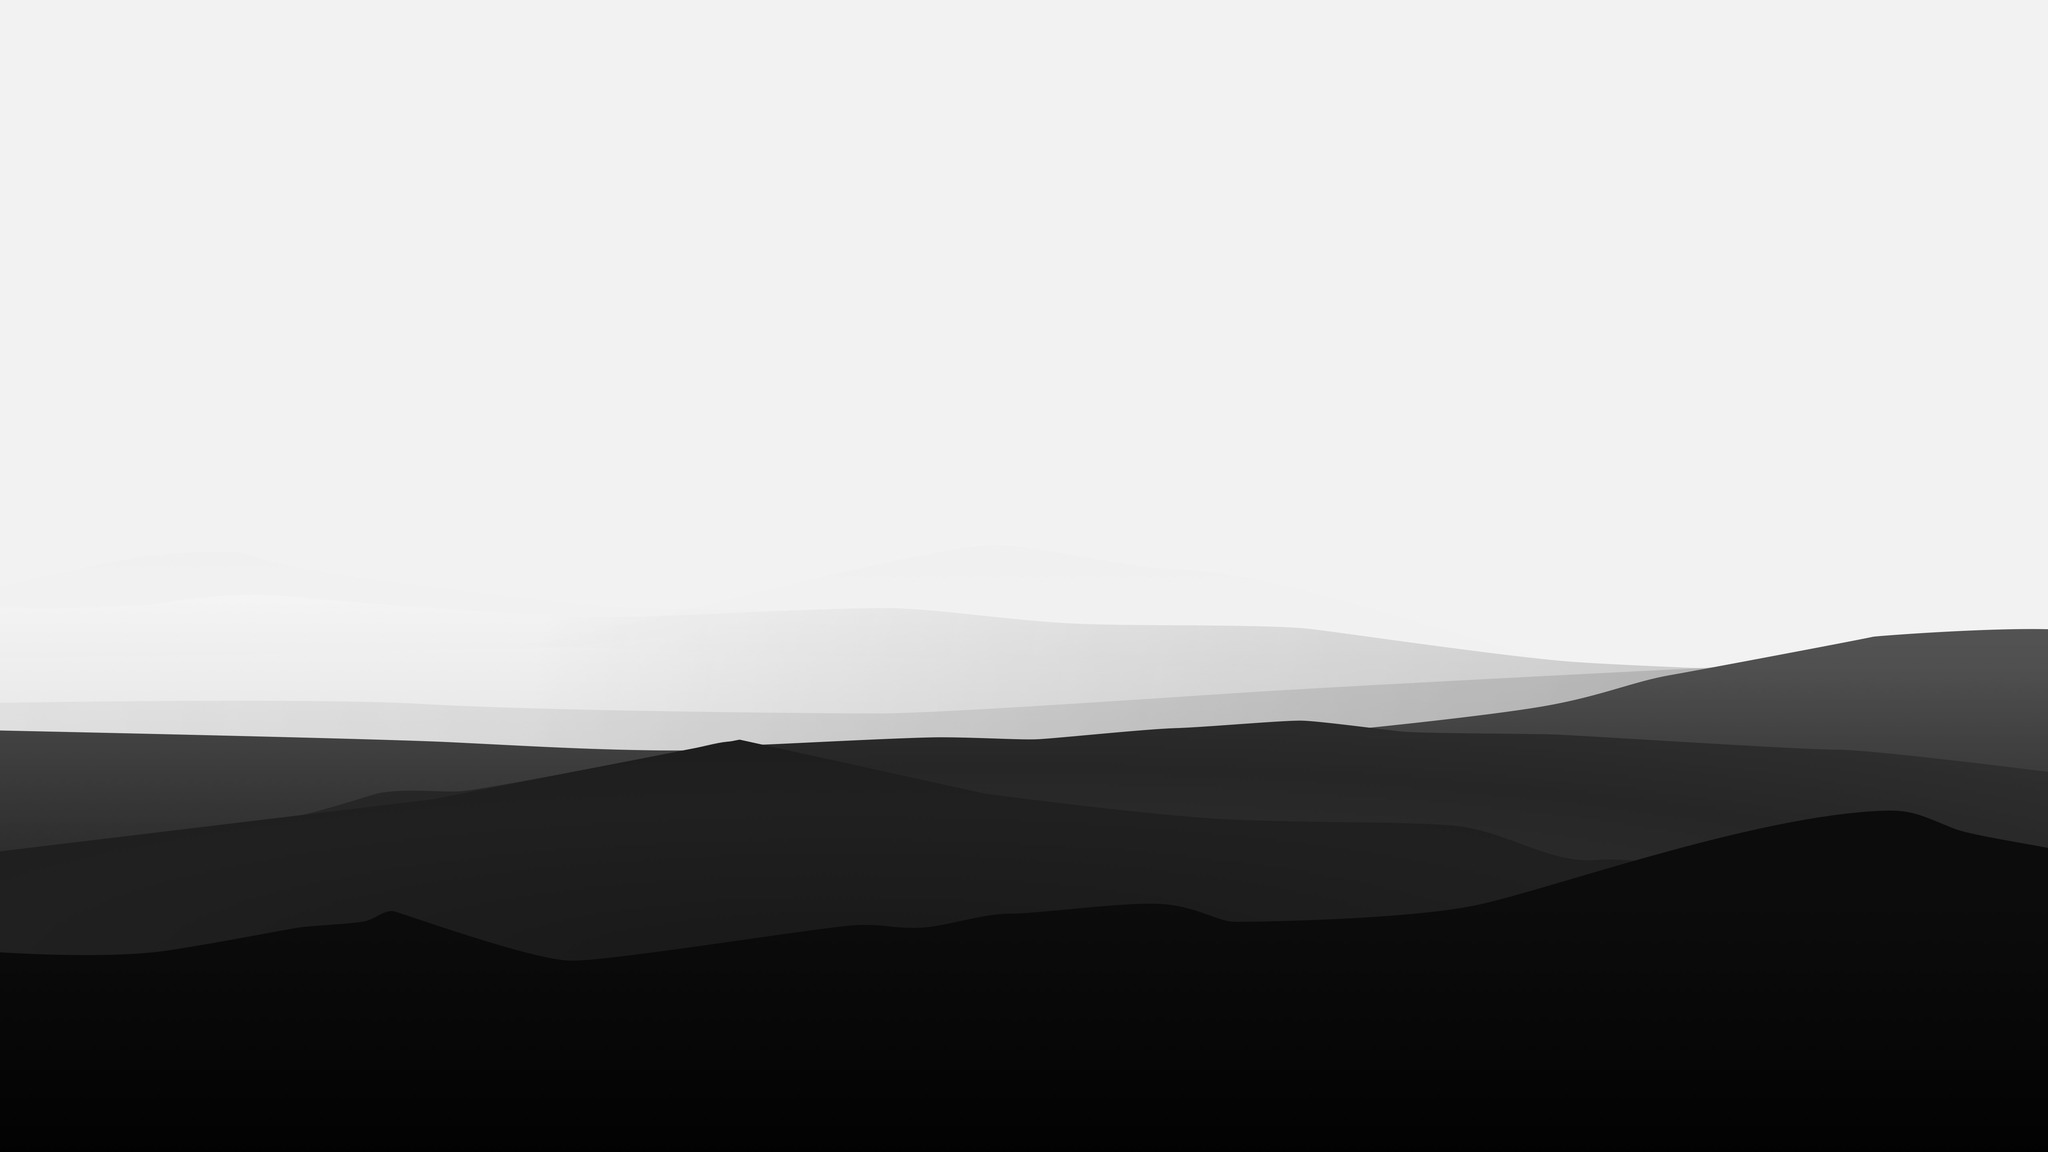 Minimalism Mountain Peak Full Hd Wallpaper: 2048x1152 Minimalist Mountains Black And White 2048x1152